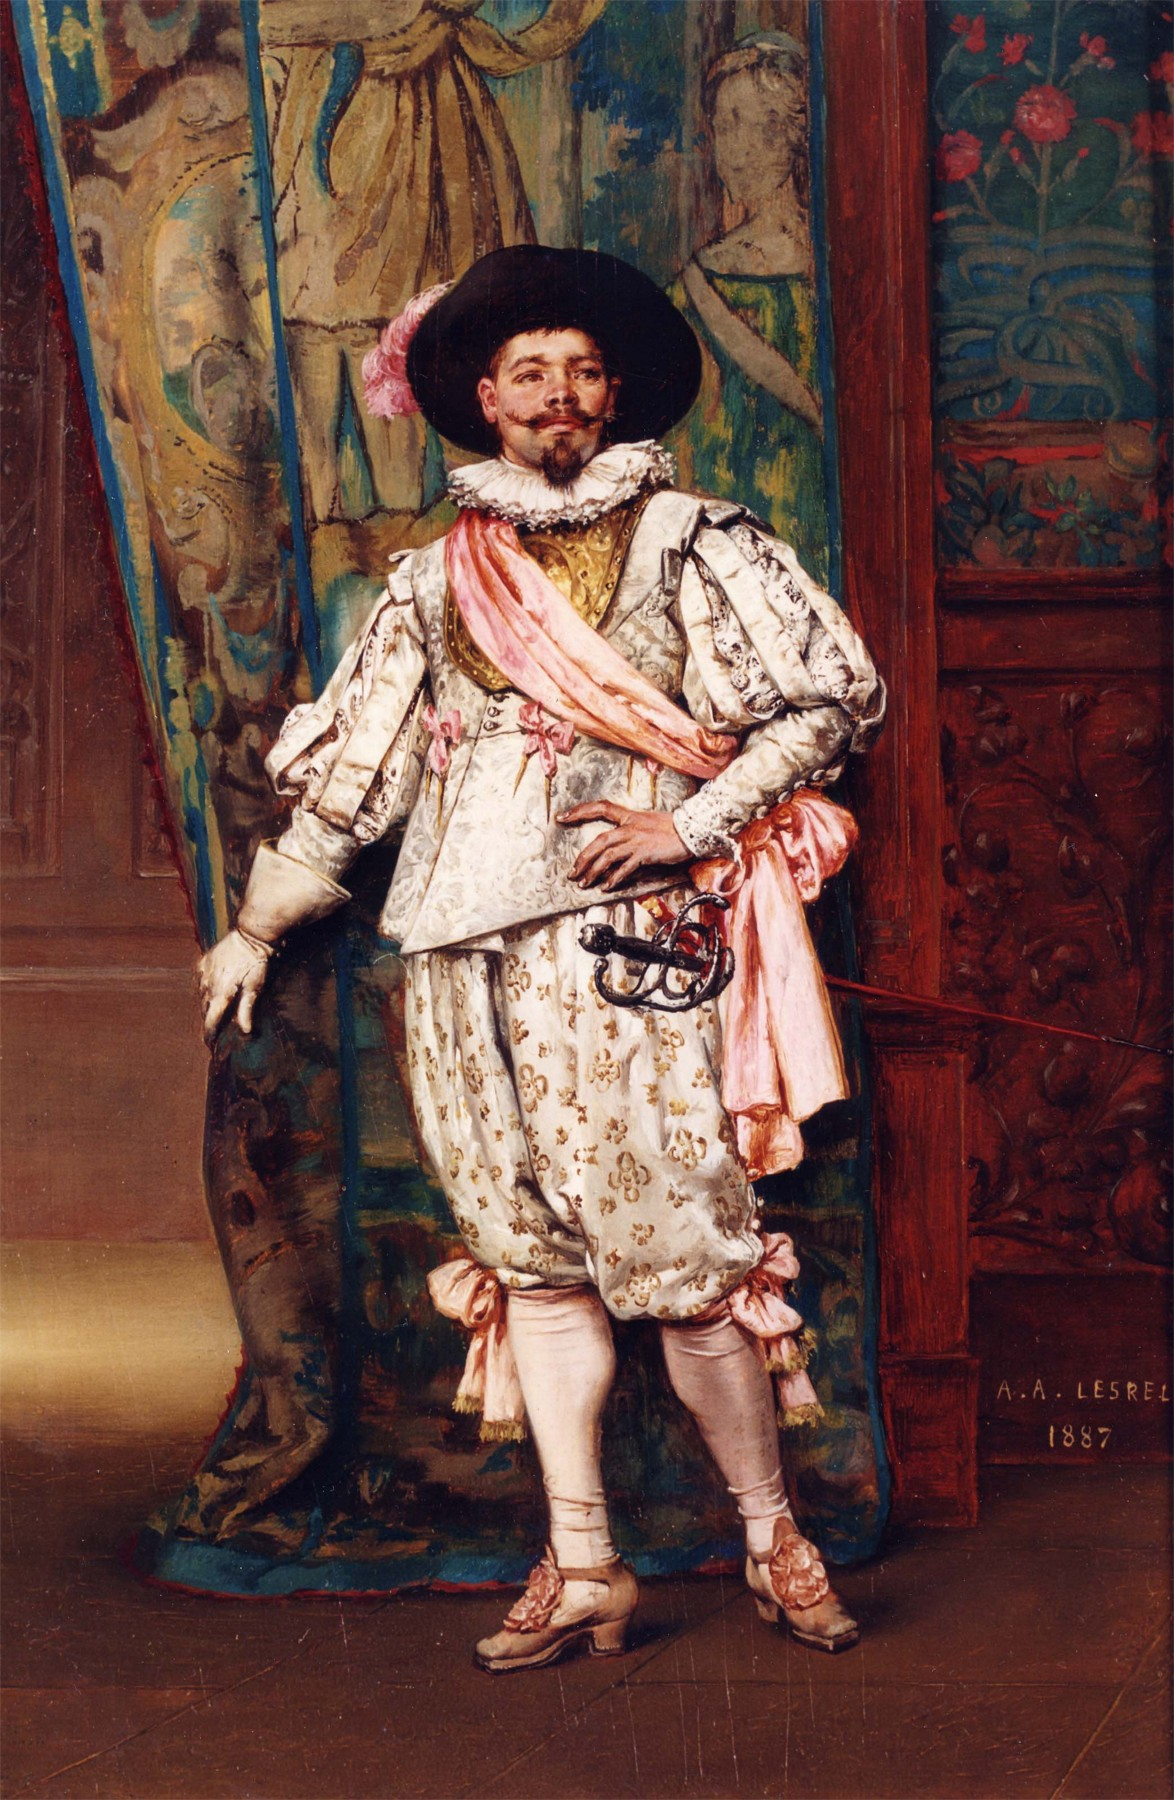 Adolphe Alexandre Lesrel - The Cavalier - 12143-2426